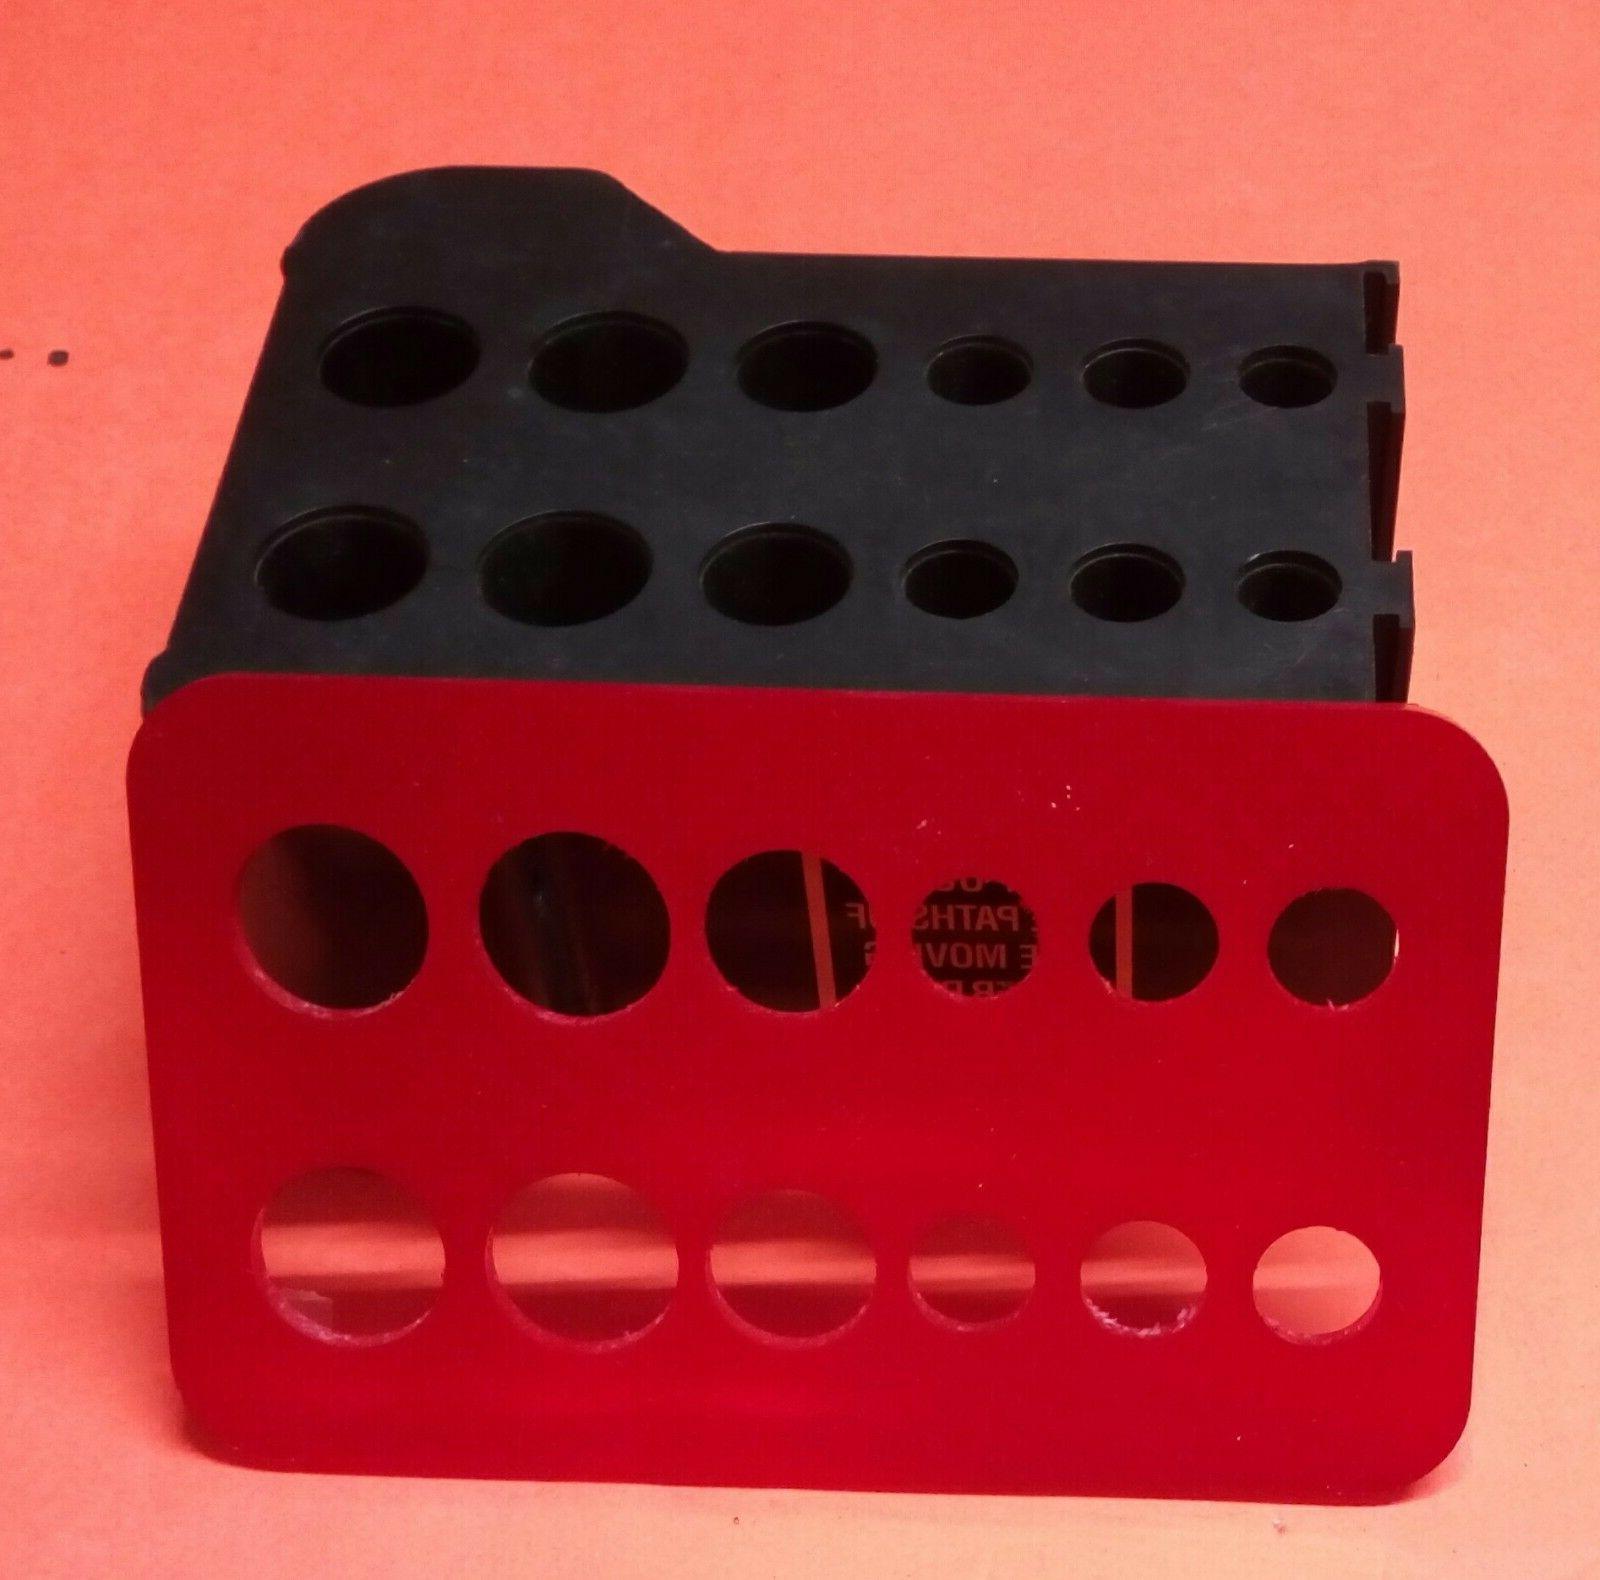 310lb power rod rejuvenator companion for bowflex